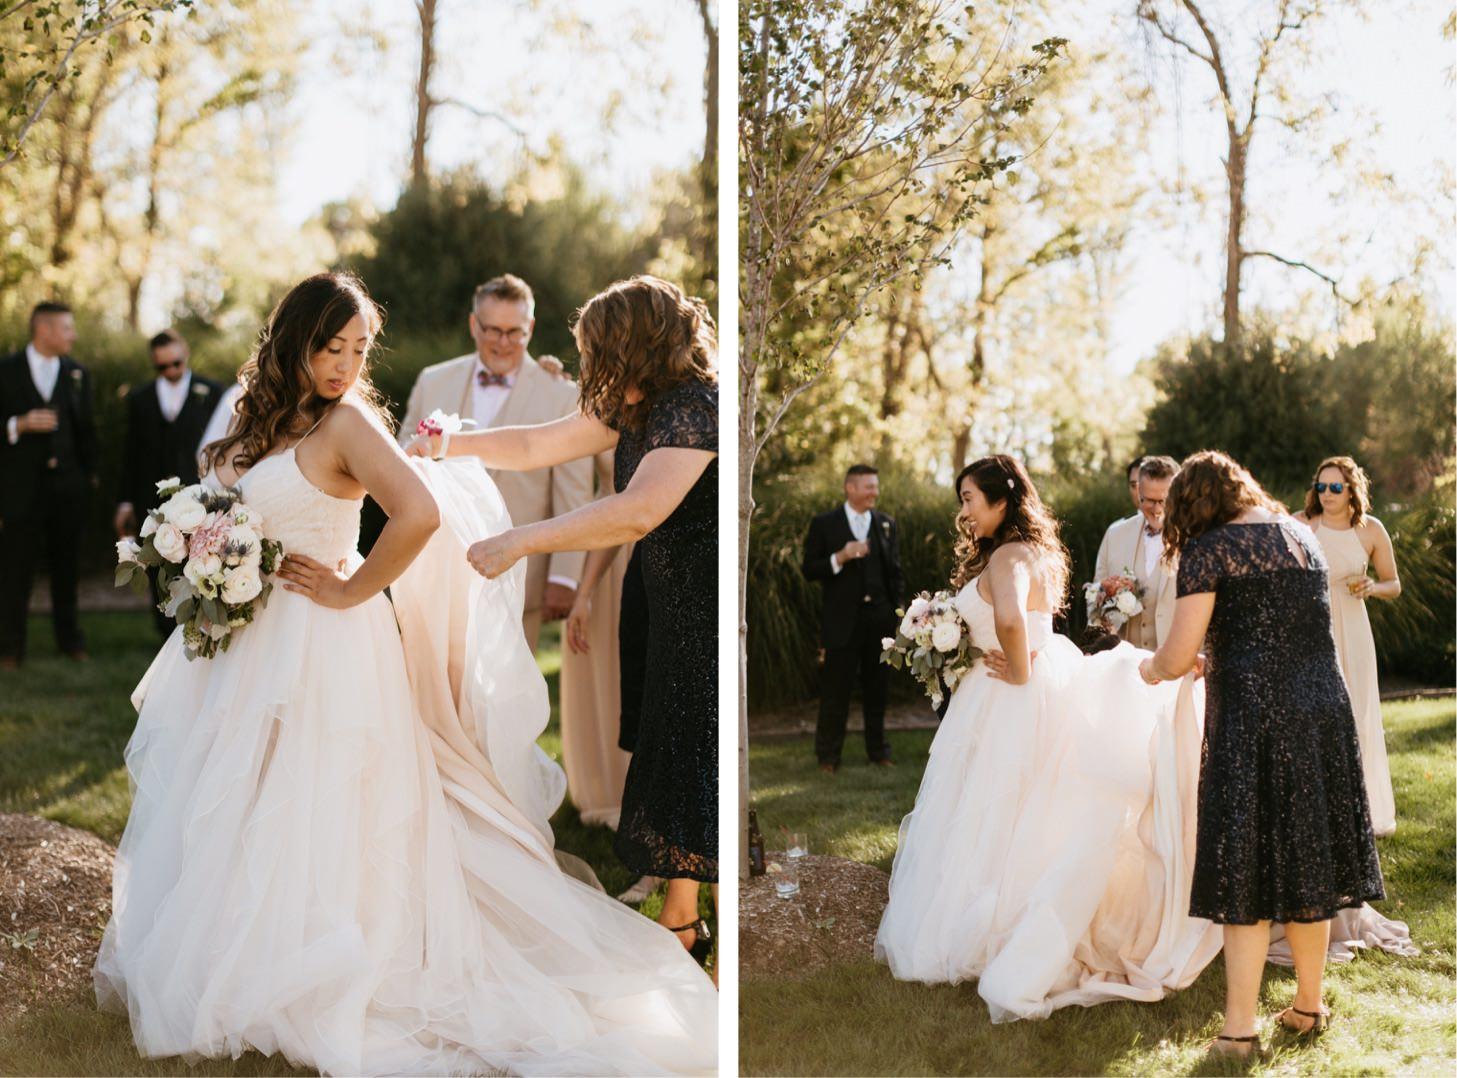 ritz-charles-wedding-reception-downtown-indianapolis-wedding-photographer021.JPG